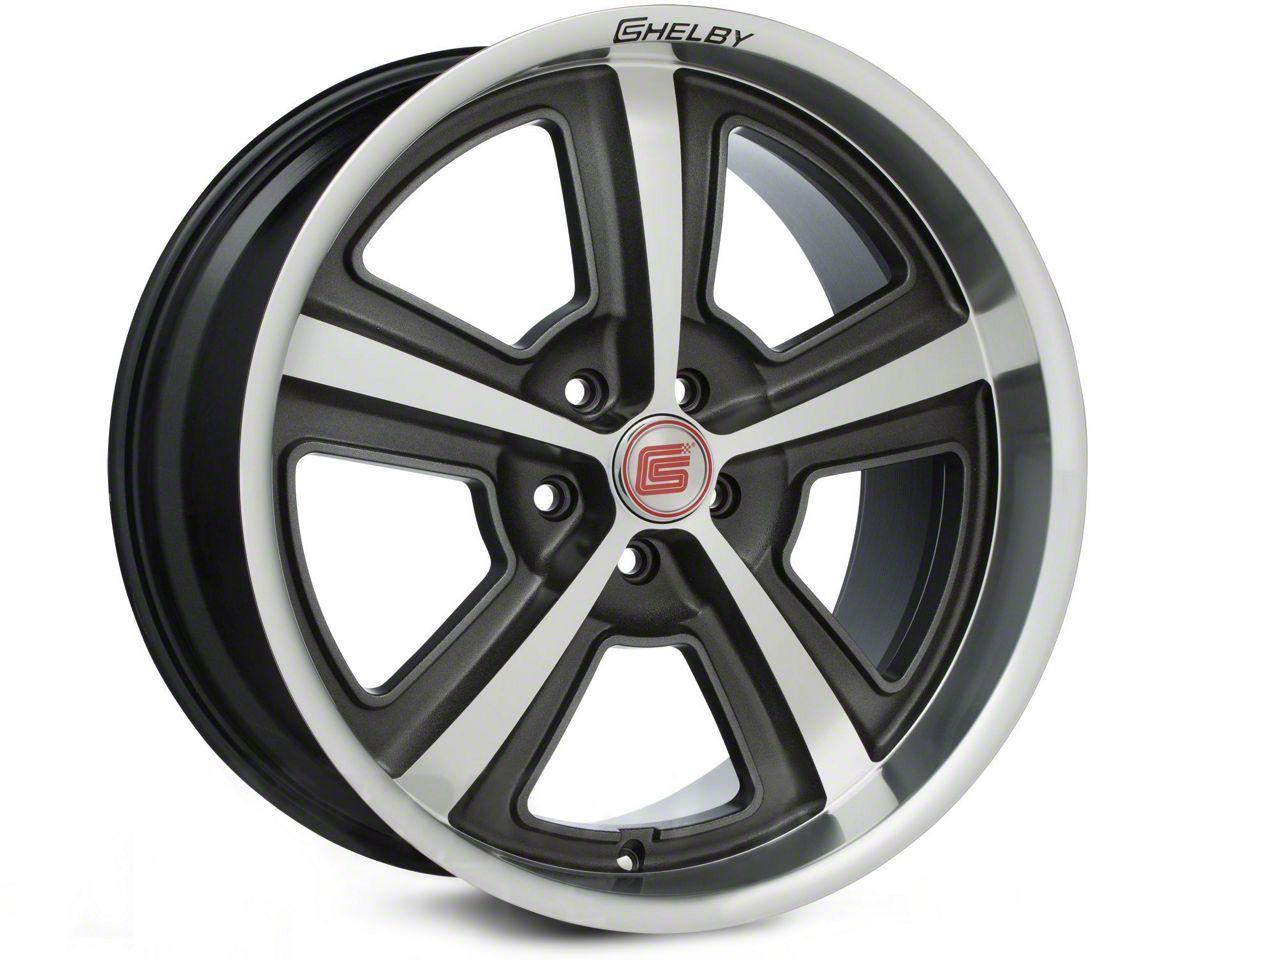 Shelby CS69 Hyper Black Wheel - 20x10 (15-17 All)